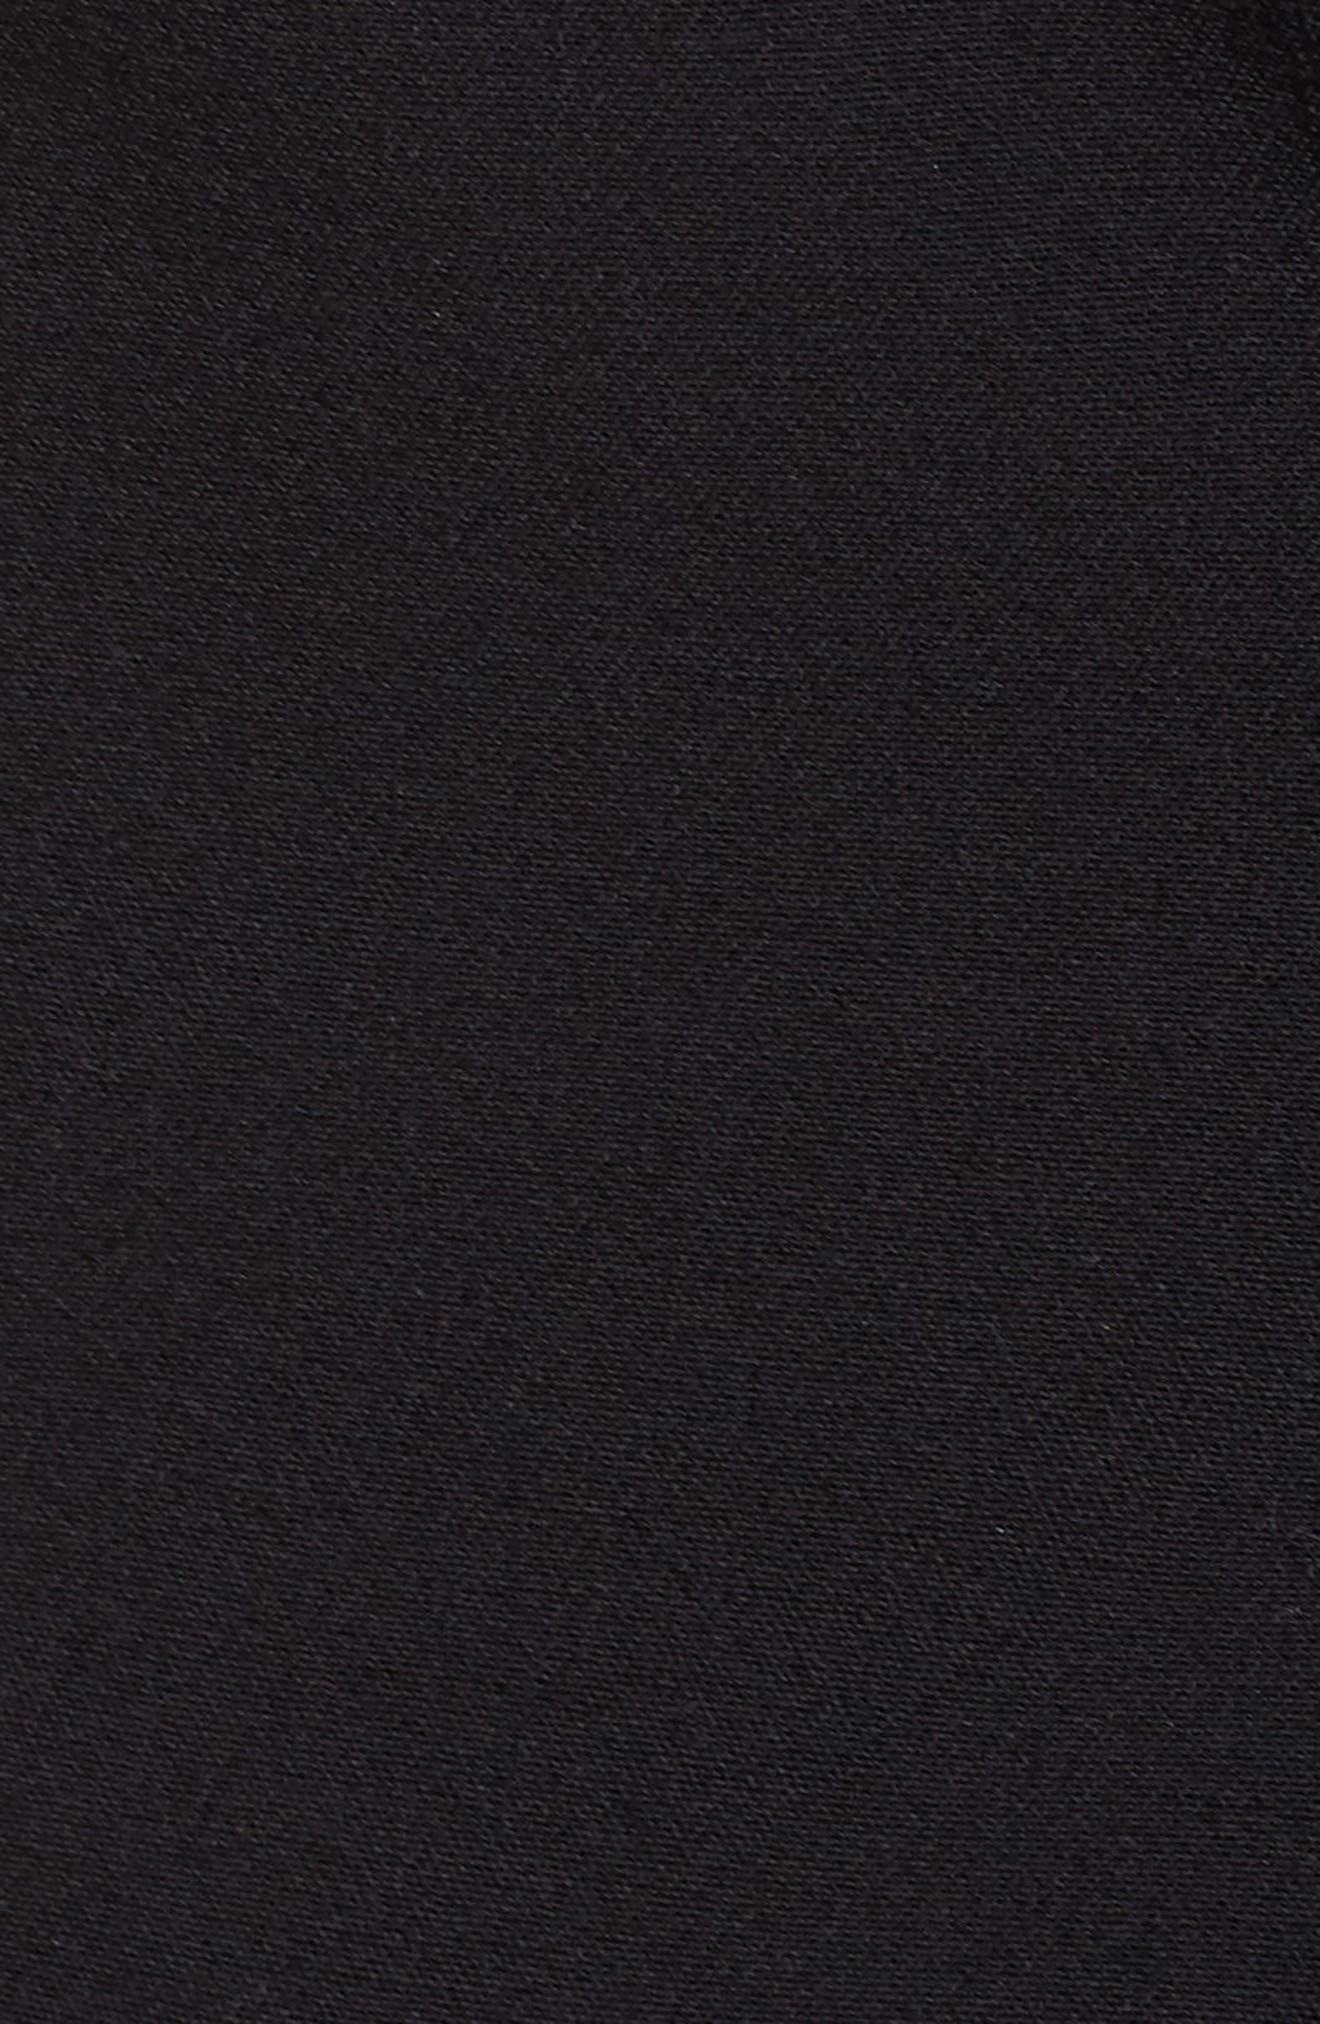 Ruched Sleeve Blazer,                             Alternate thumbnail 5, color,                             Black